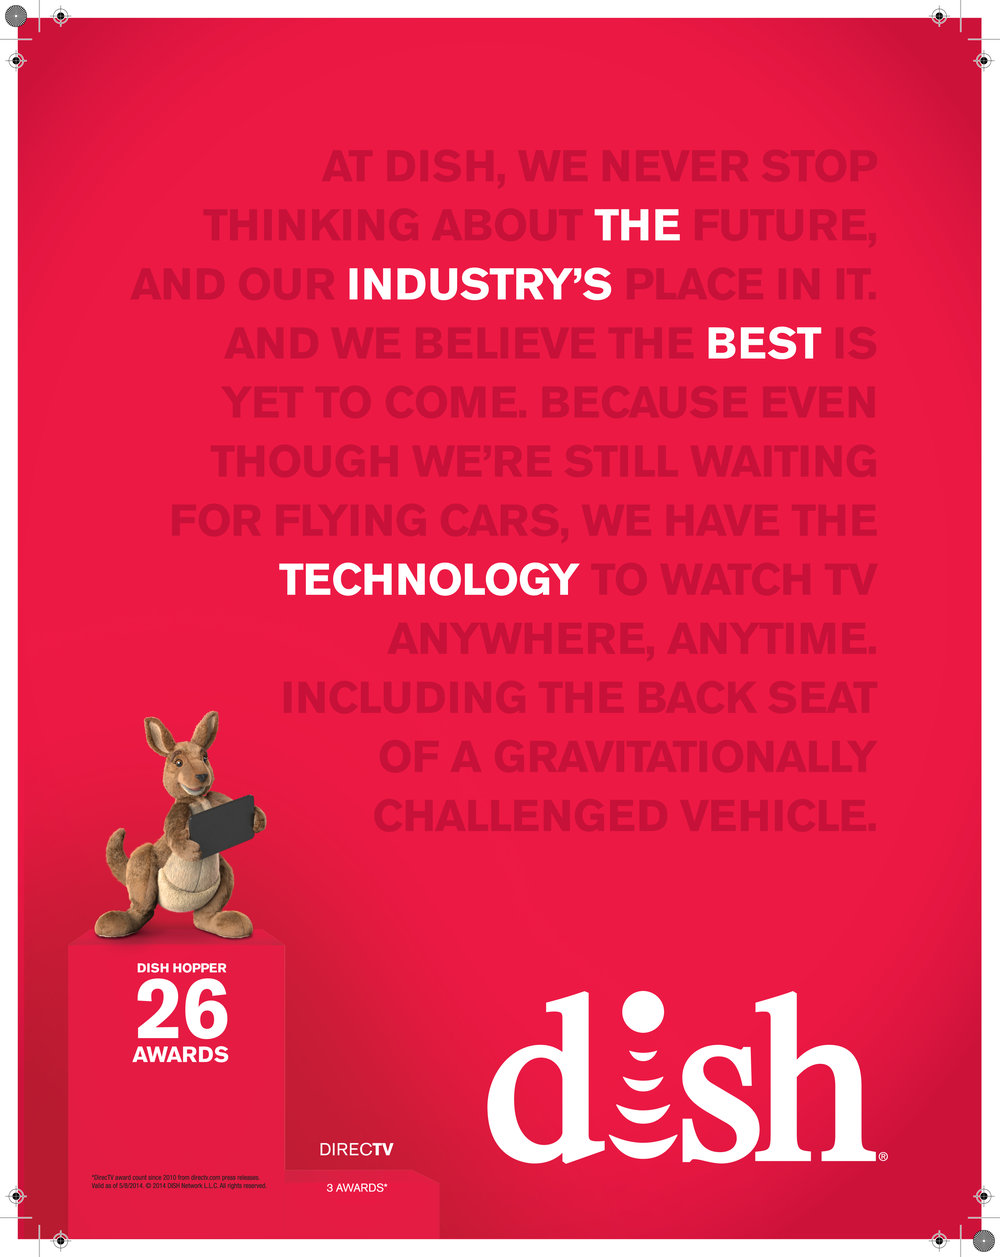 BRAND_9823_13229 Industry Pub Print Ad_Know DISH No DISH SBN.jpg